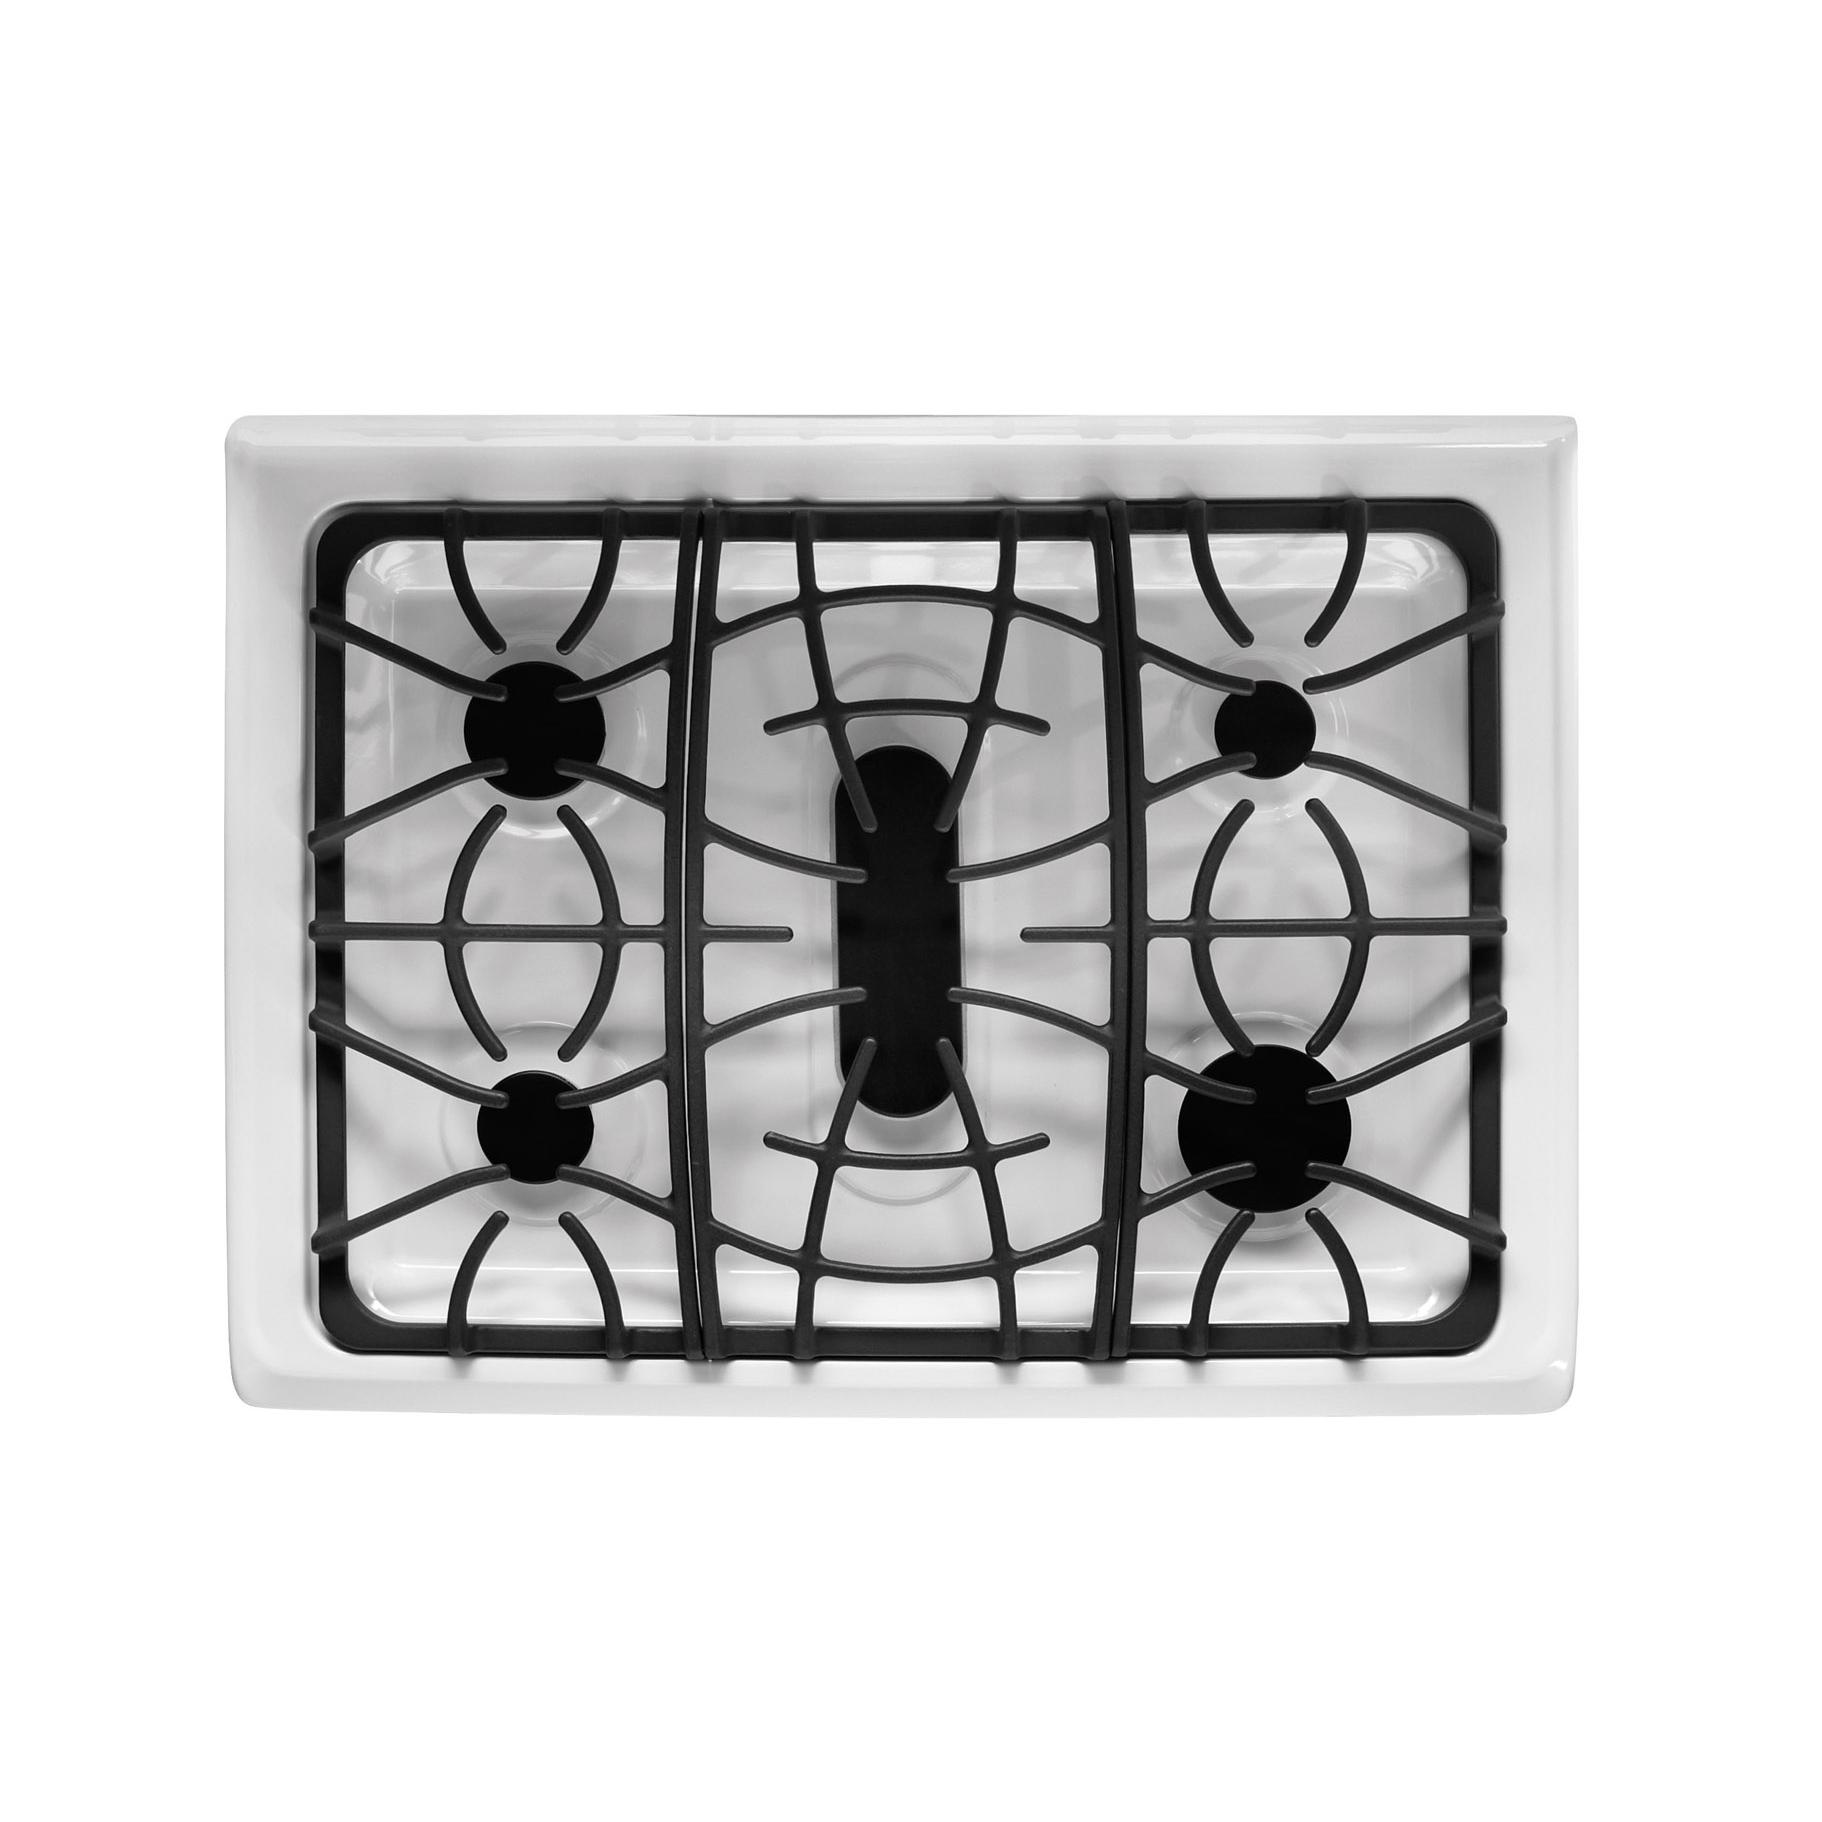 Frigidaire Gallery 5.0 cu. ft. Freestanding Gas Range w/ Effortless™ Temperature Probe - White